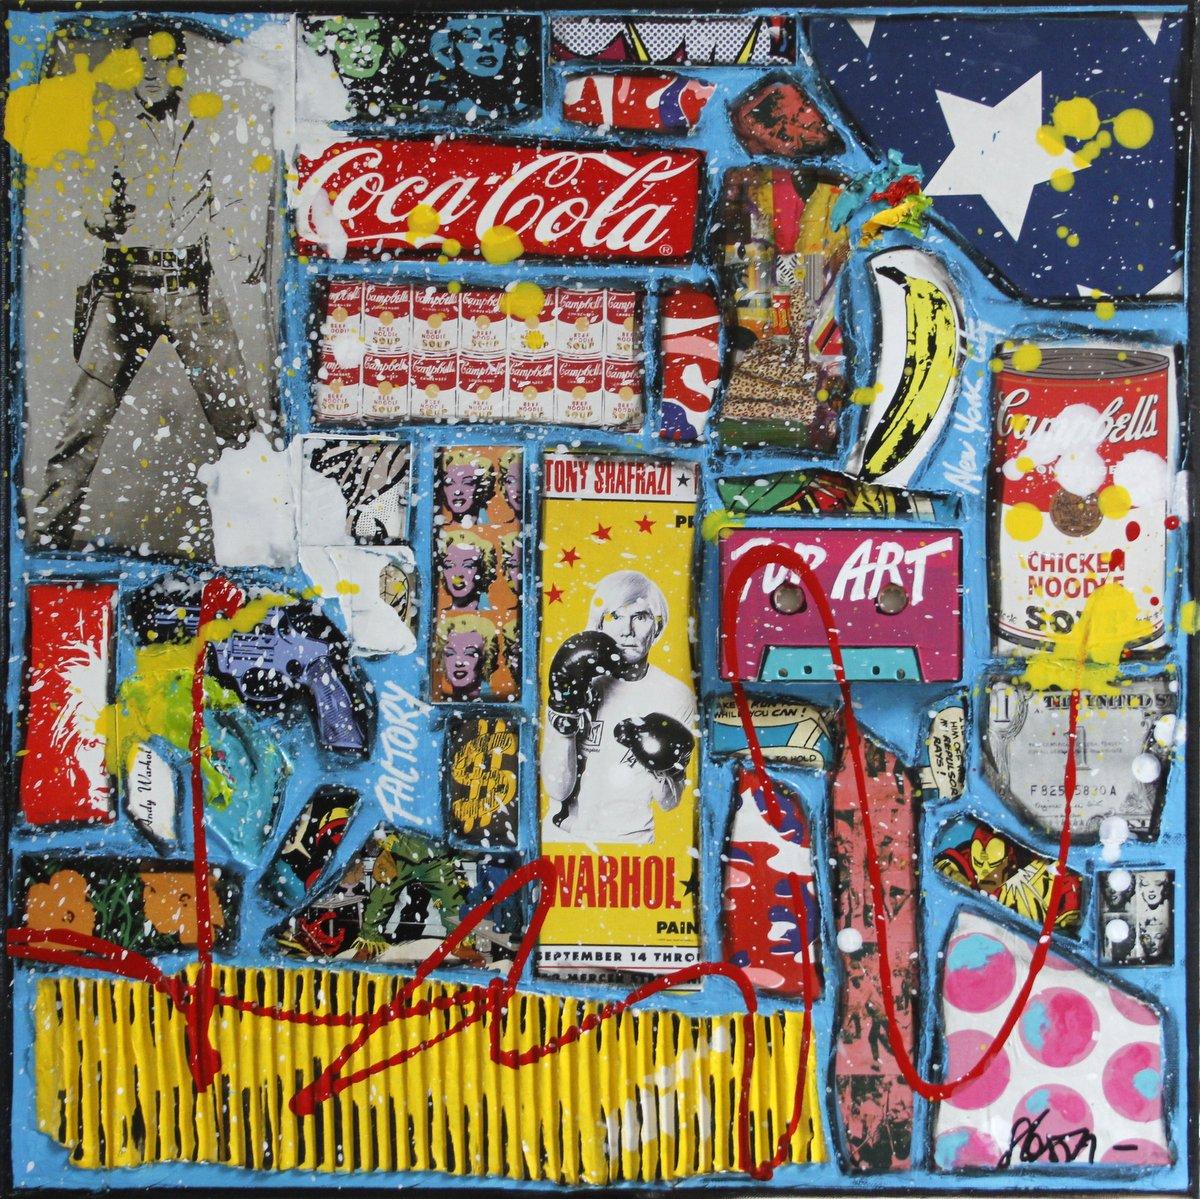 collage, andy warhol Tableau Contemporain, Warhol Attitude. Sophie Costa, artiste peintre.